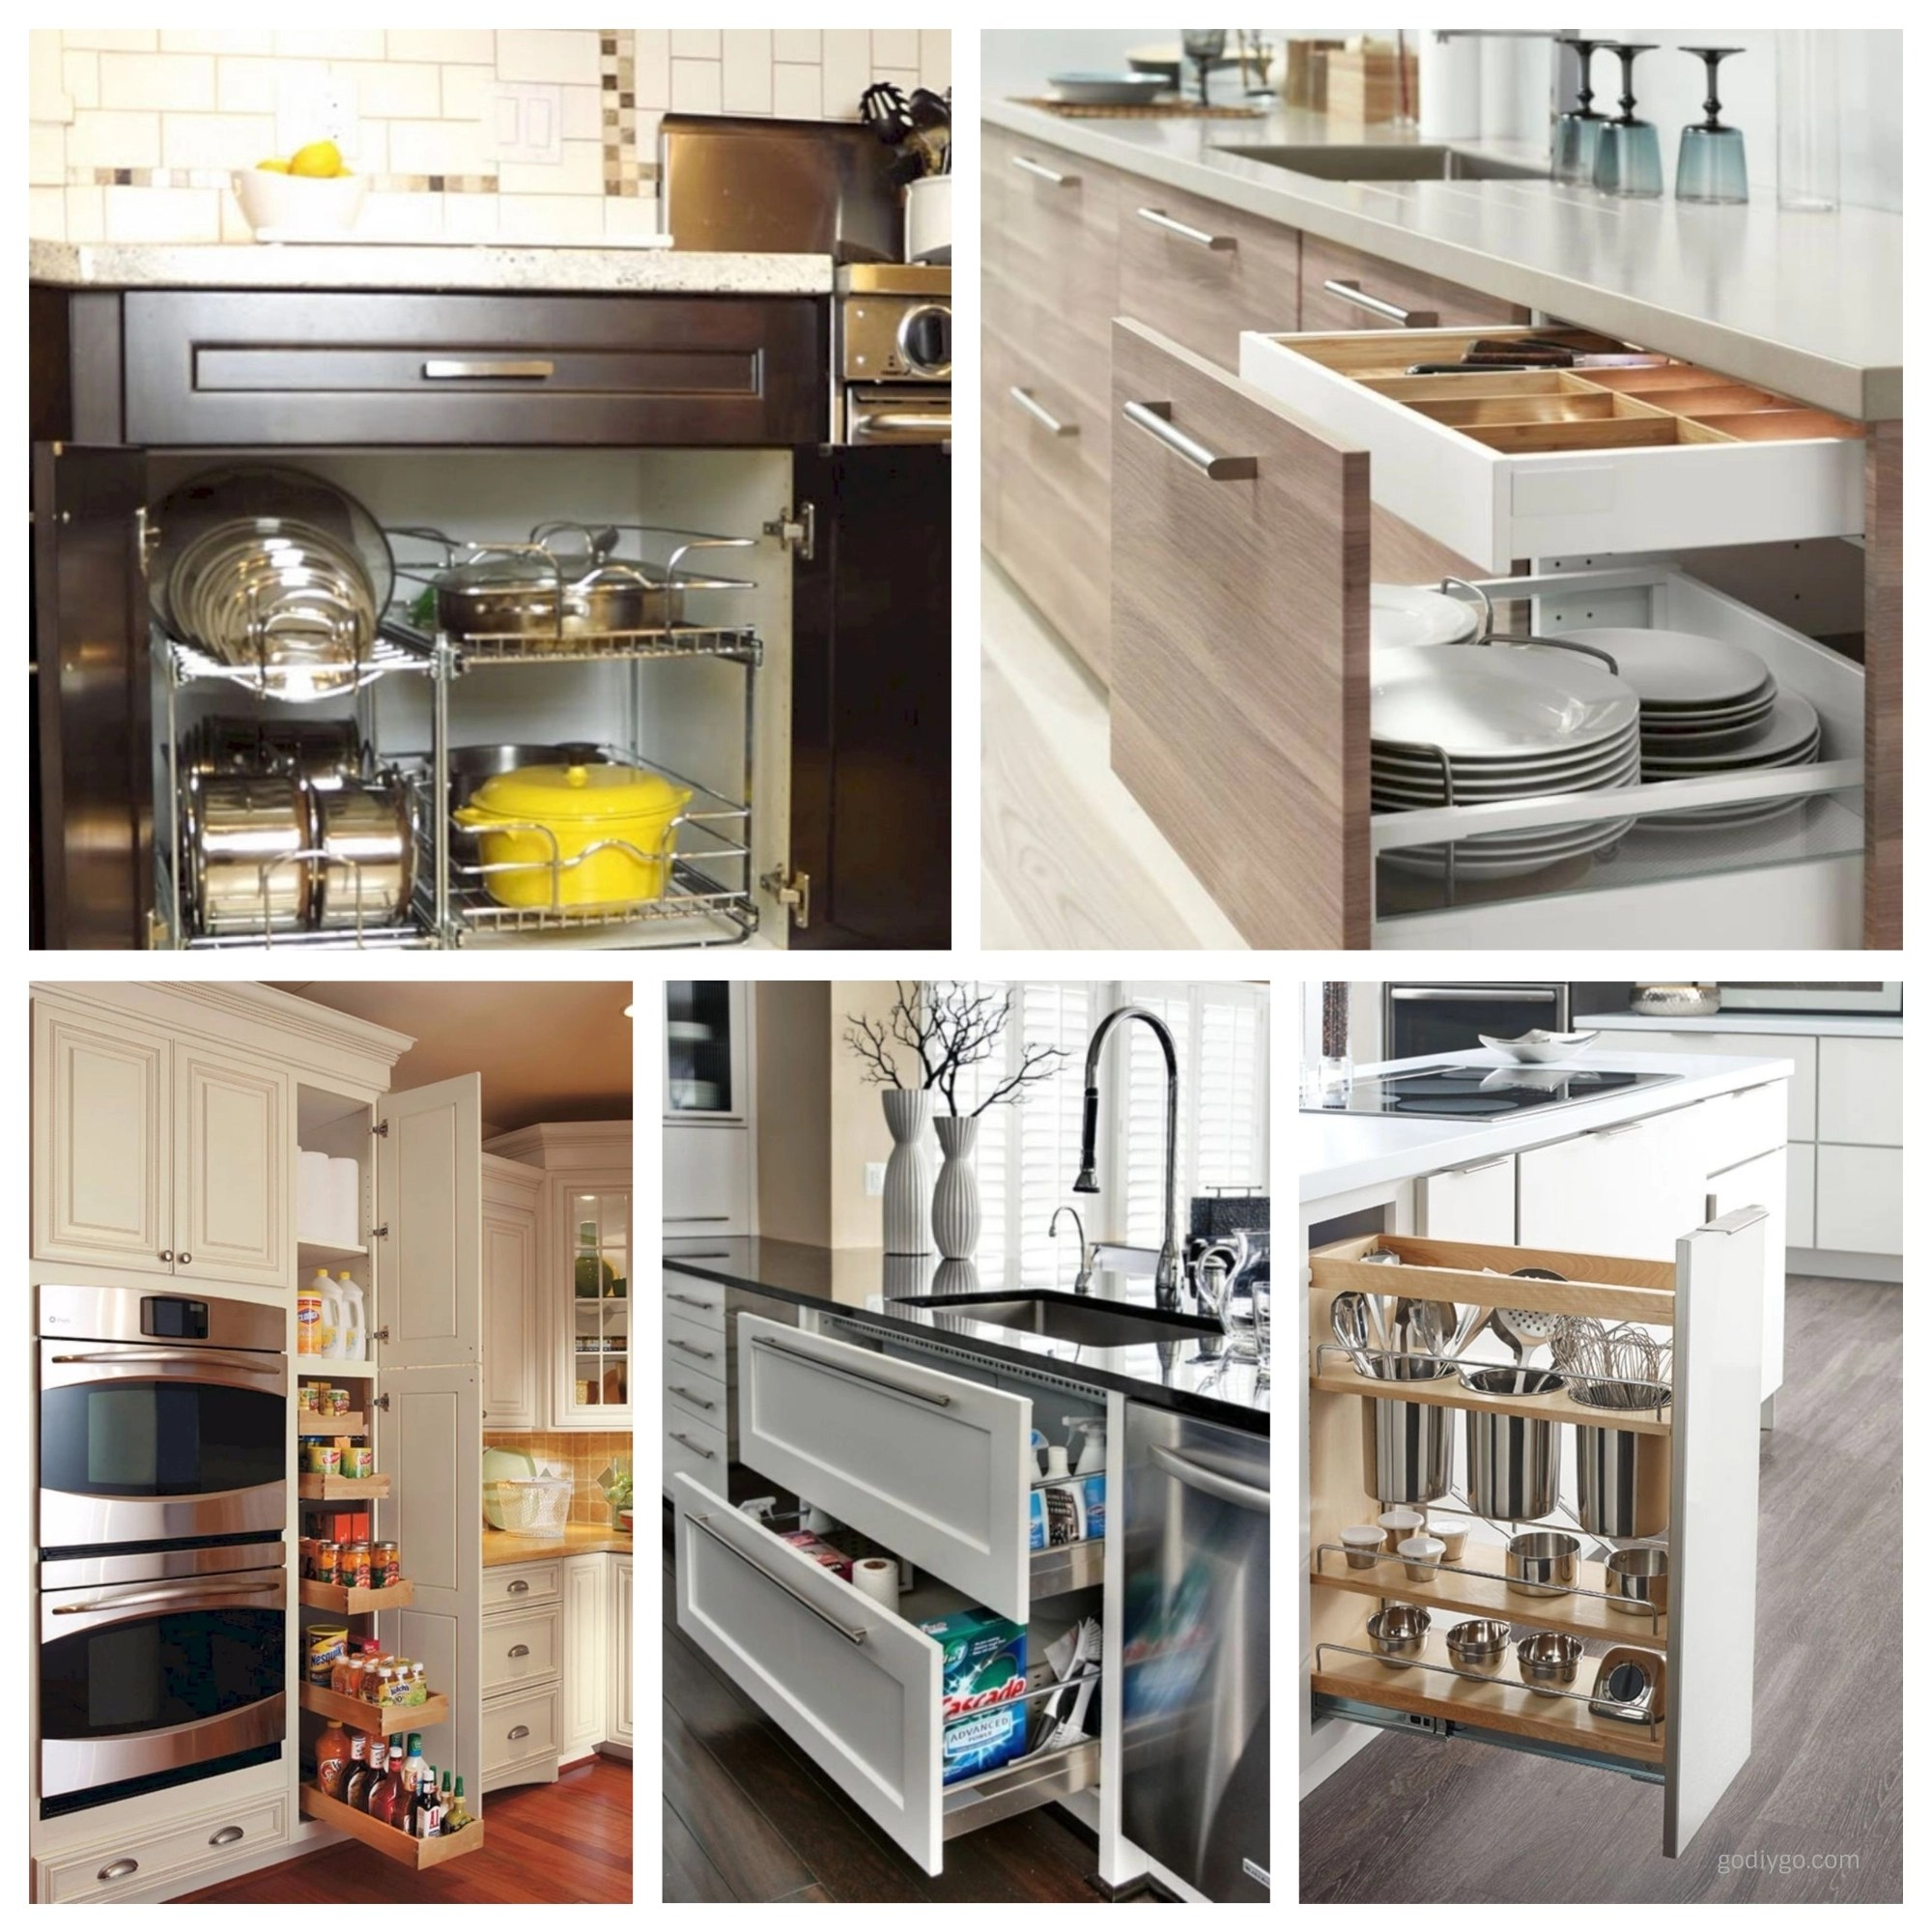 44 smart kitchen cabinet organization ideas  godiygo